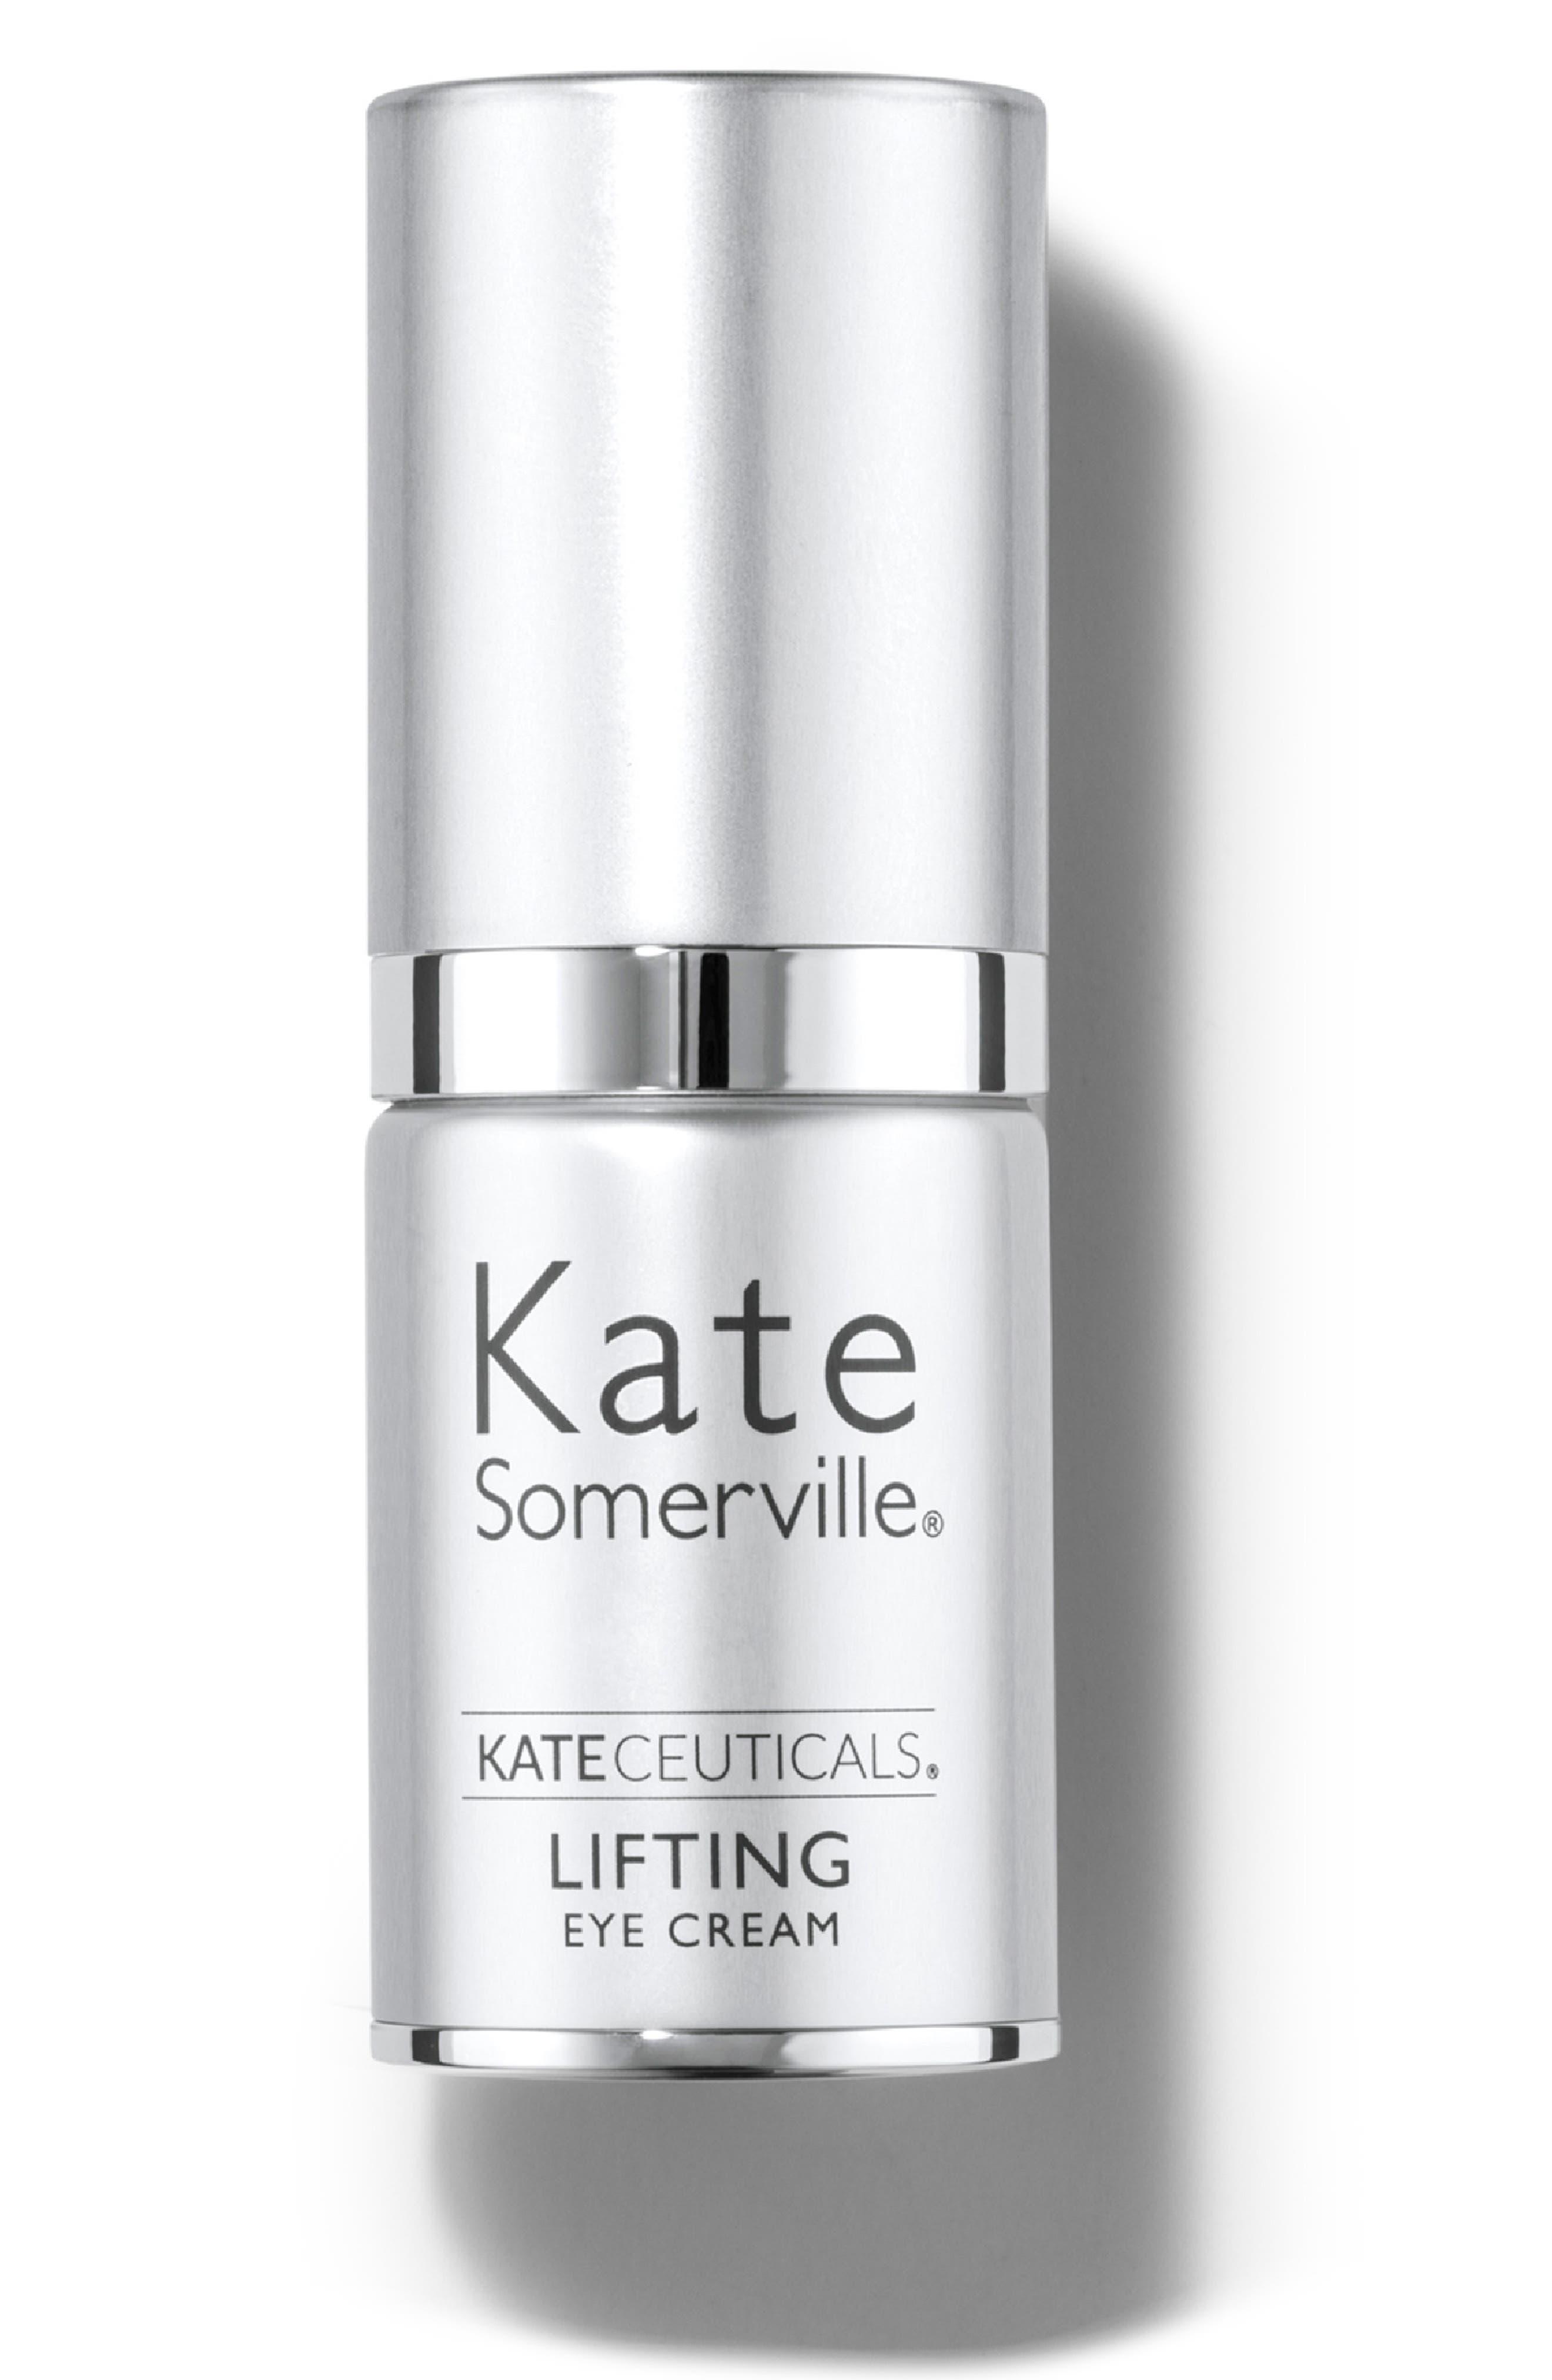 Kate Somerville(R) Kateceuticals(R) Lifting Eye Cream